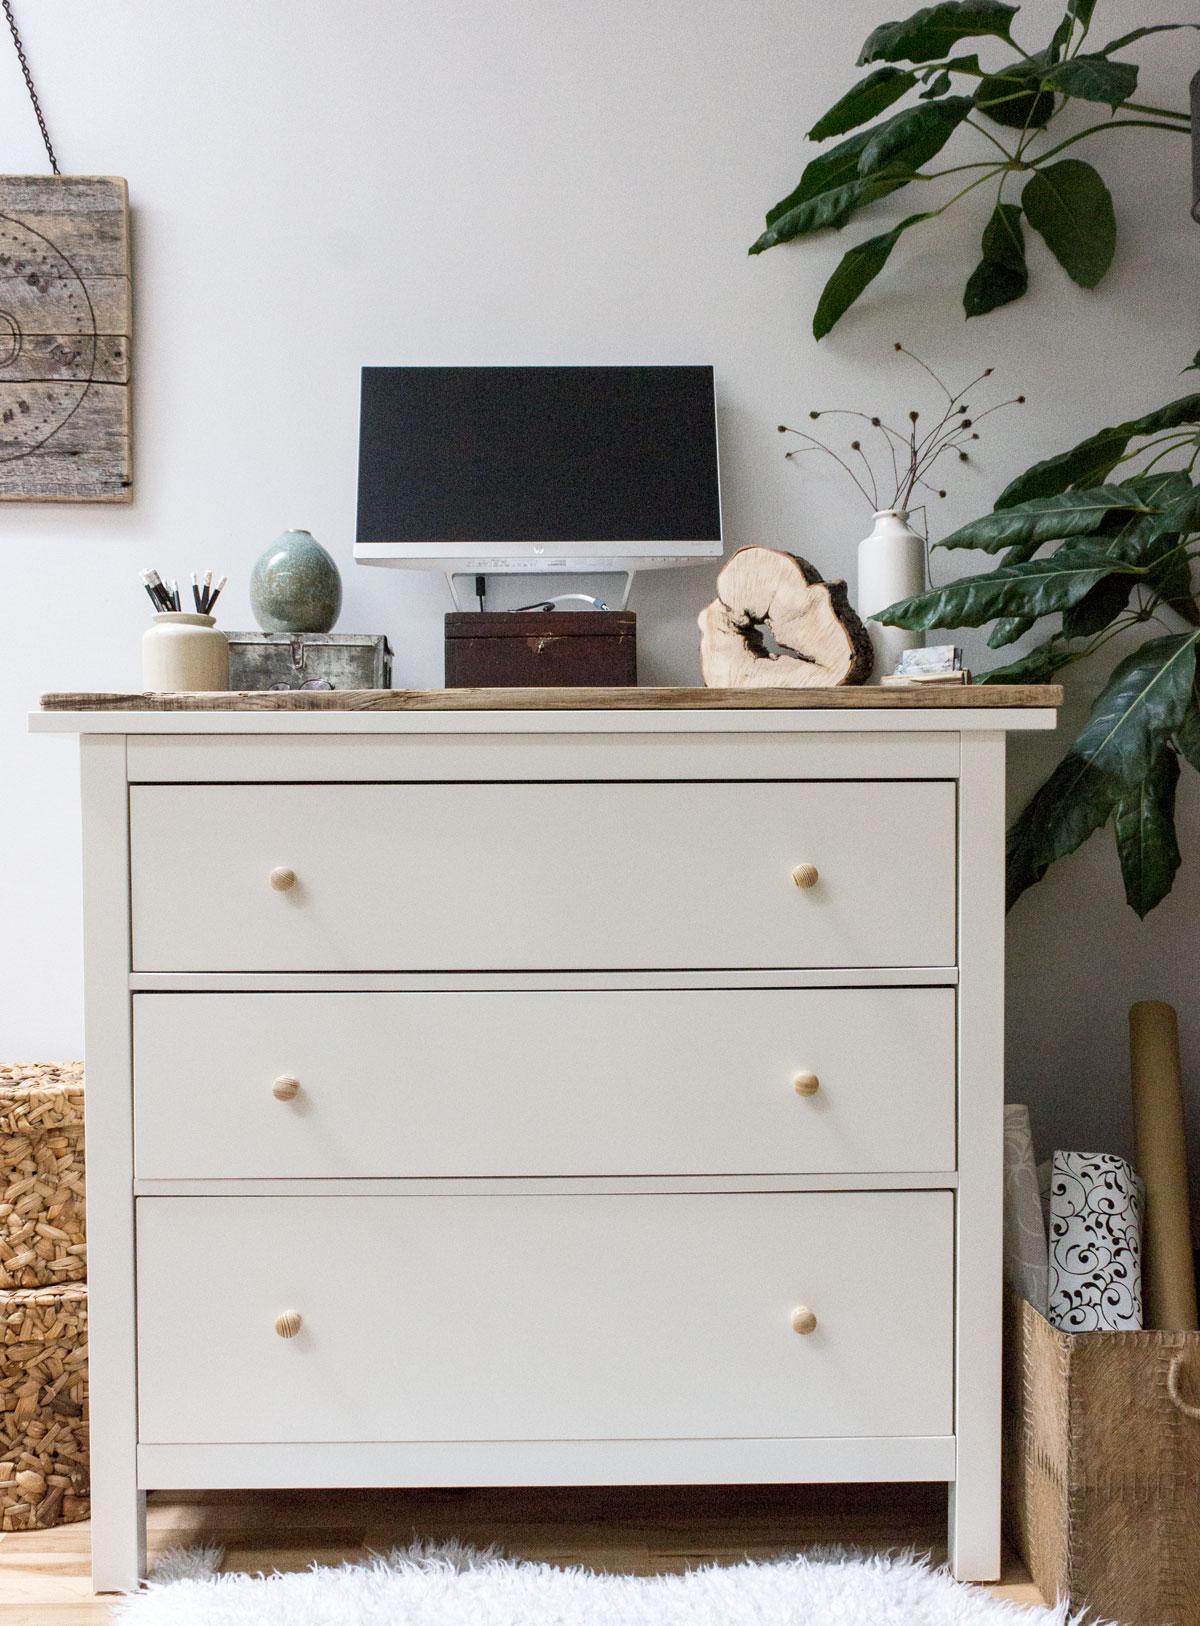 Click for full post on DIY standing desk from an IKEA dresser